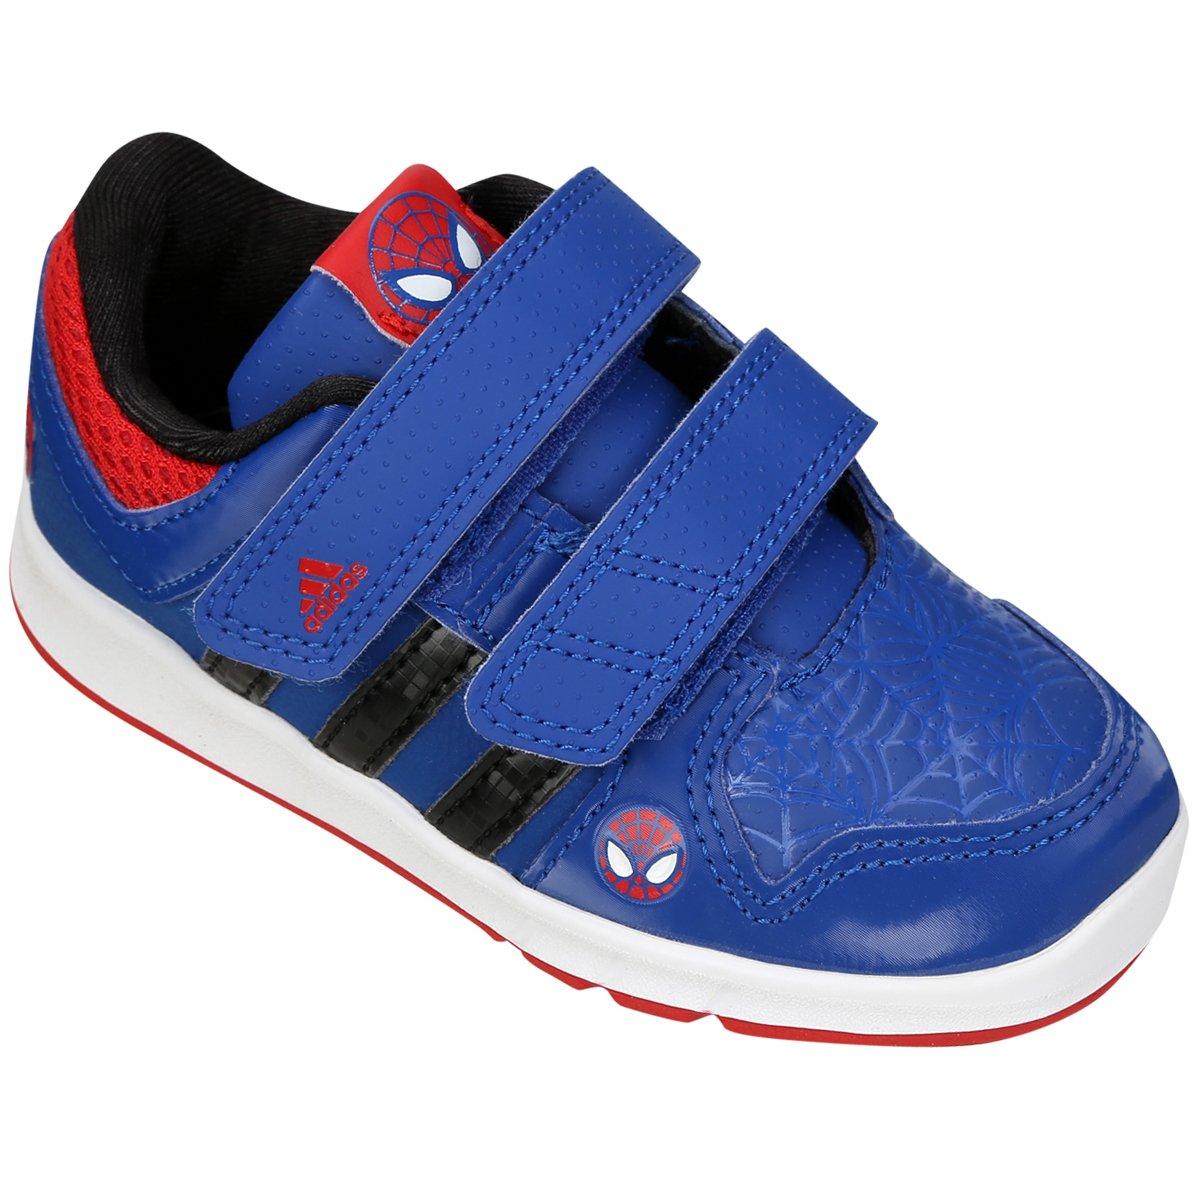 c4bdca2d890 Tênis Adidas Lk Spider Man Cf Infantil - Compre Agora